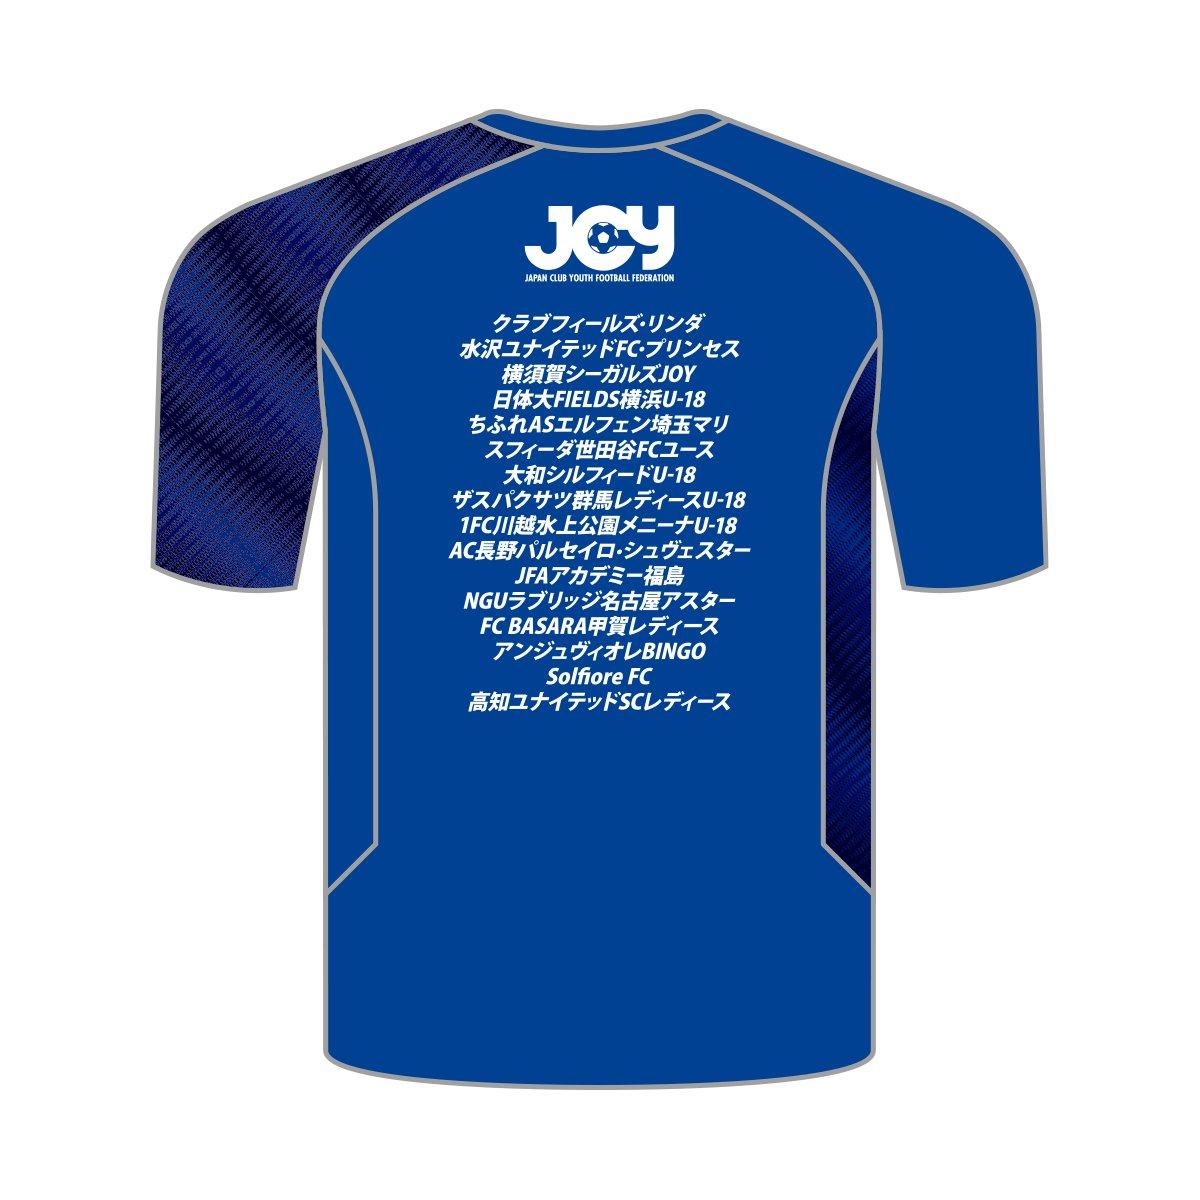 XF CUP 2020 第2回 日本クラブユース女子サッカー大会(U-18)オフィシャル記念Tシャツ ブルー